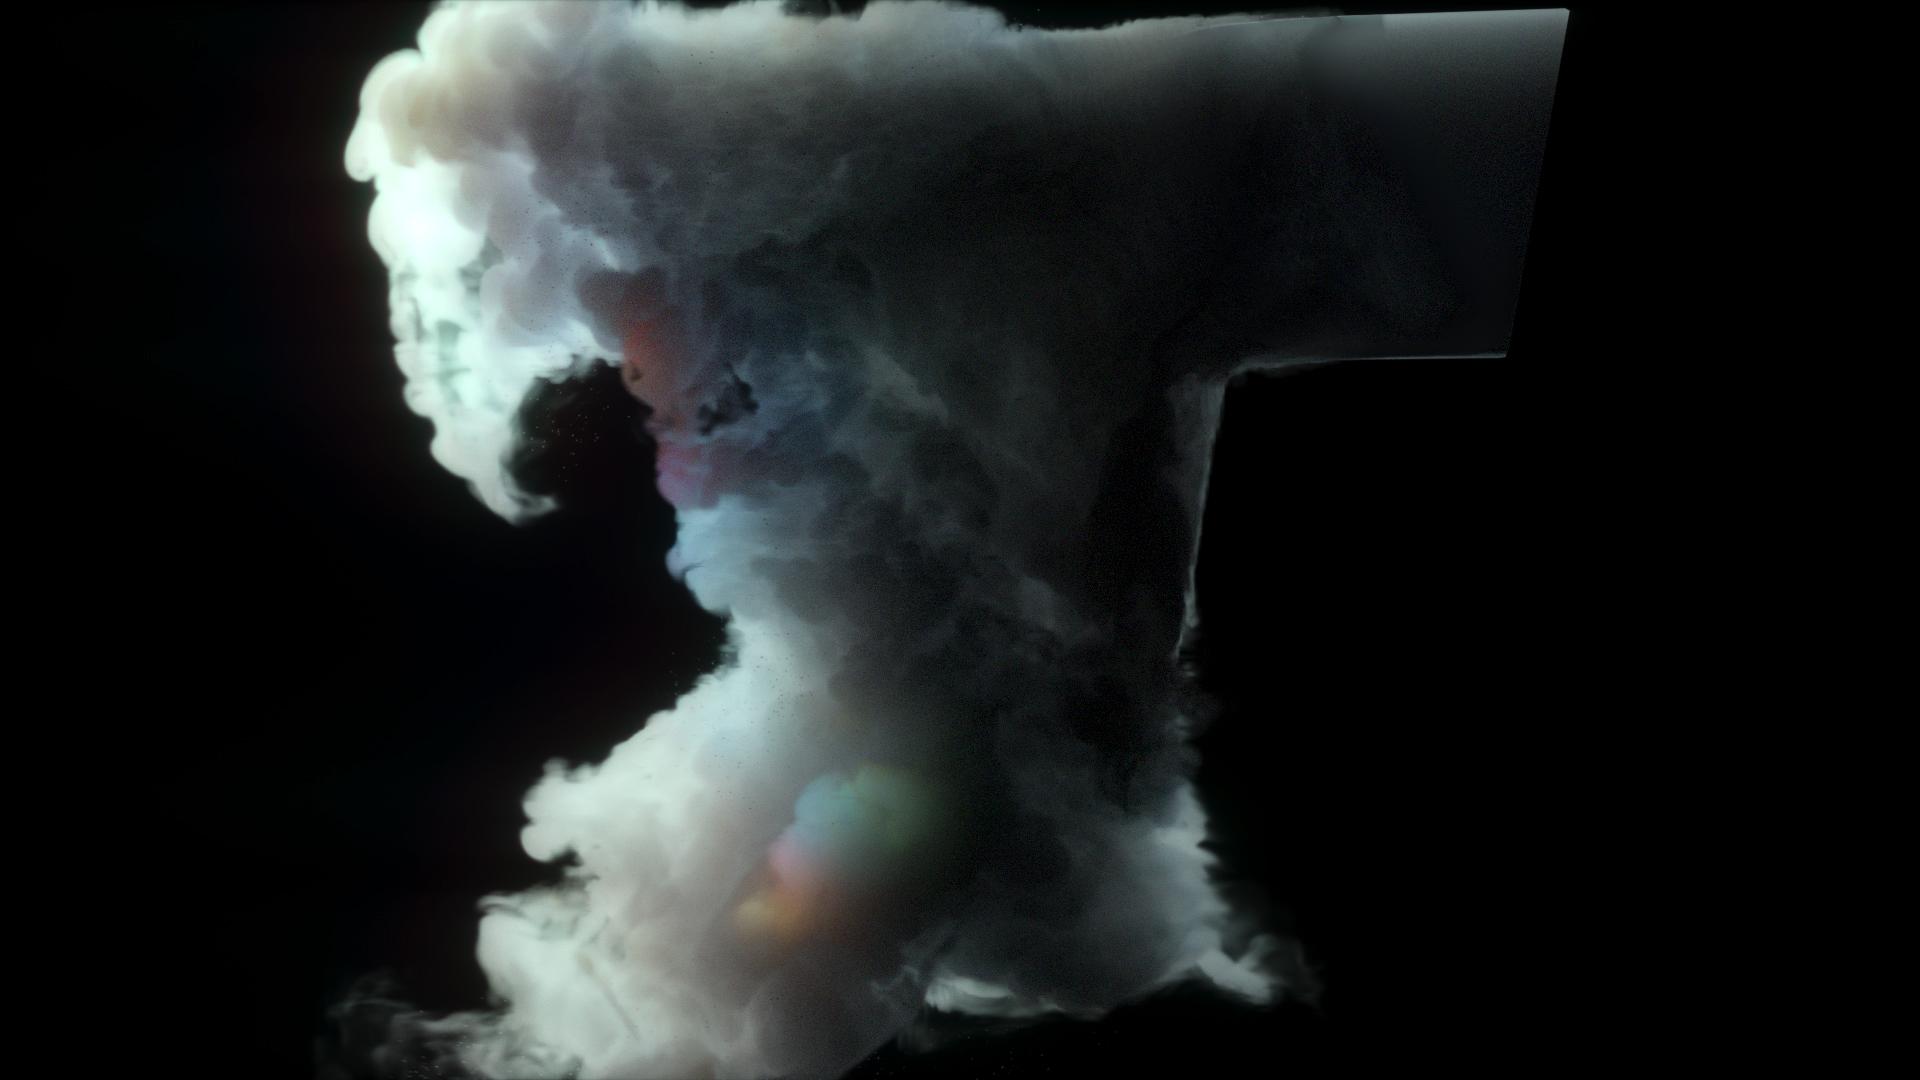 turner_smoke_0003_Layer 2.jpg